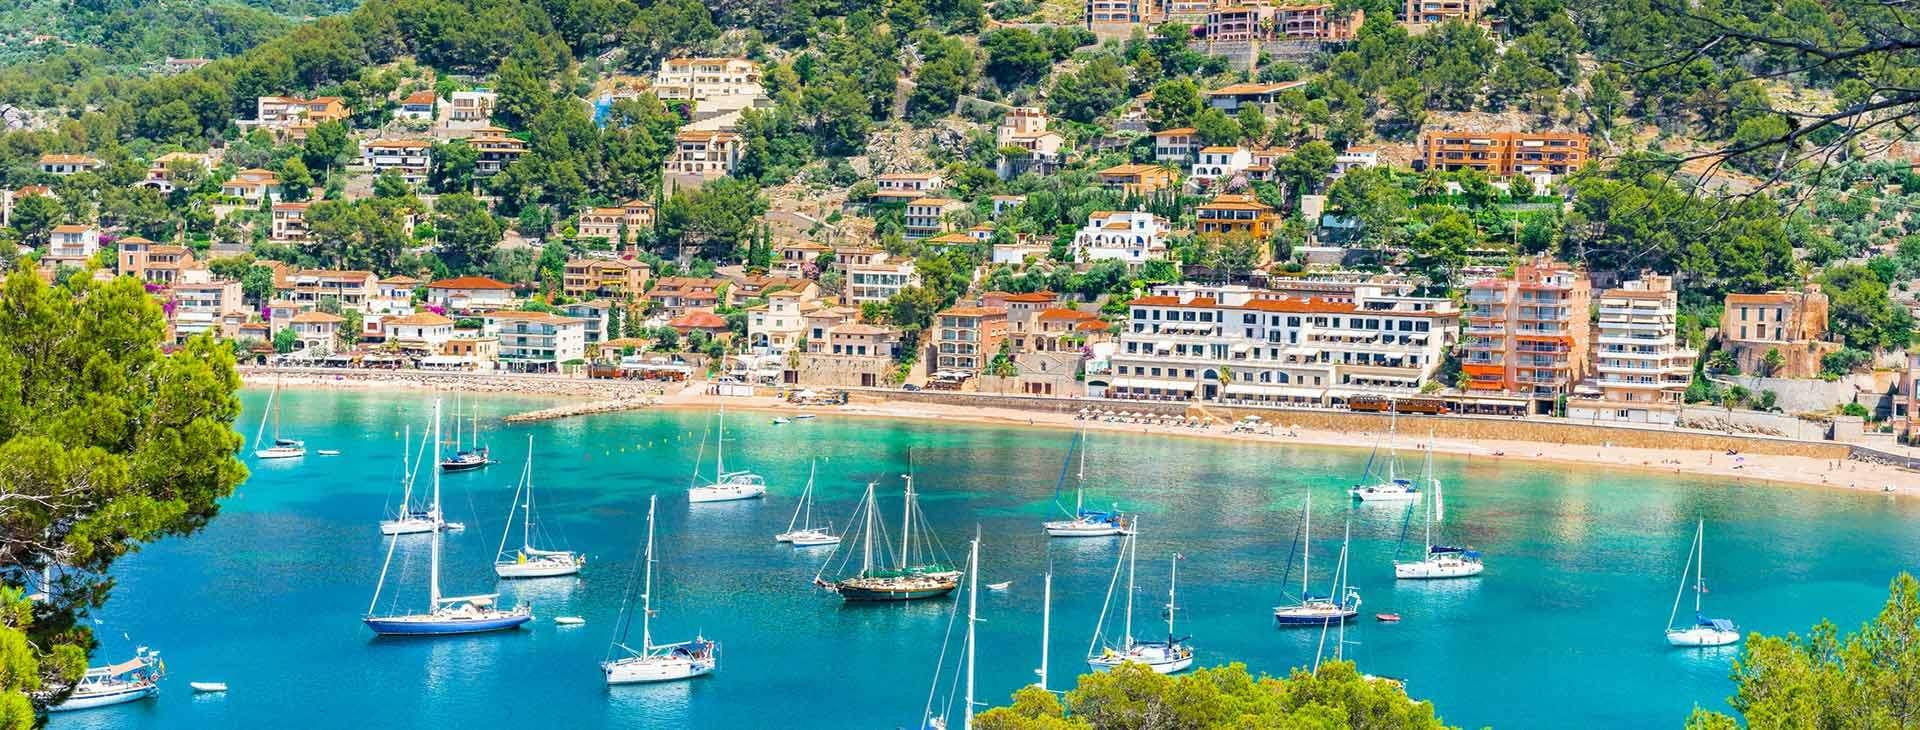 Costa Pacifica /  Włochy, Hiszpania i Malta